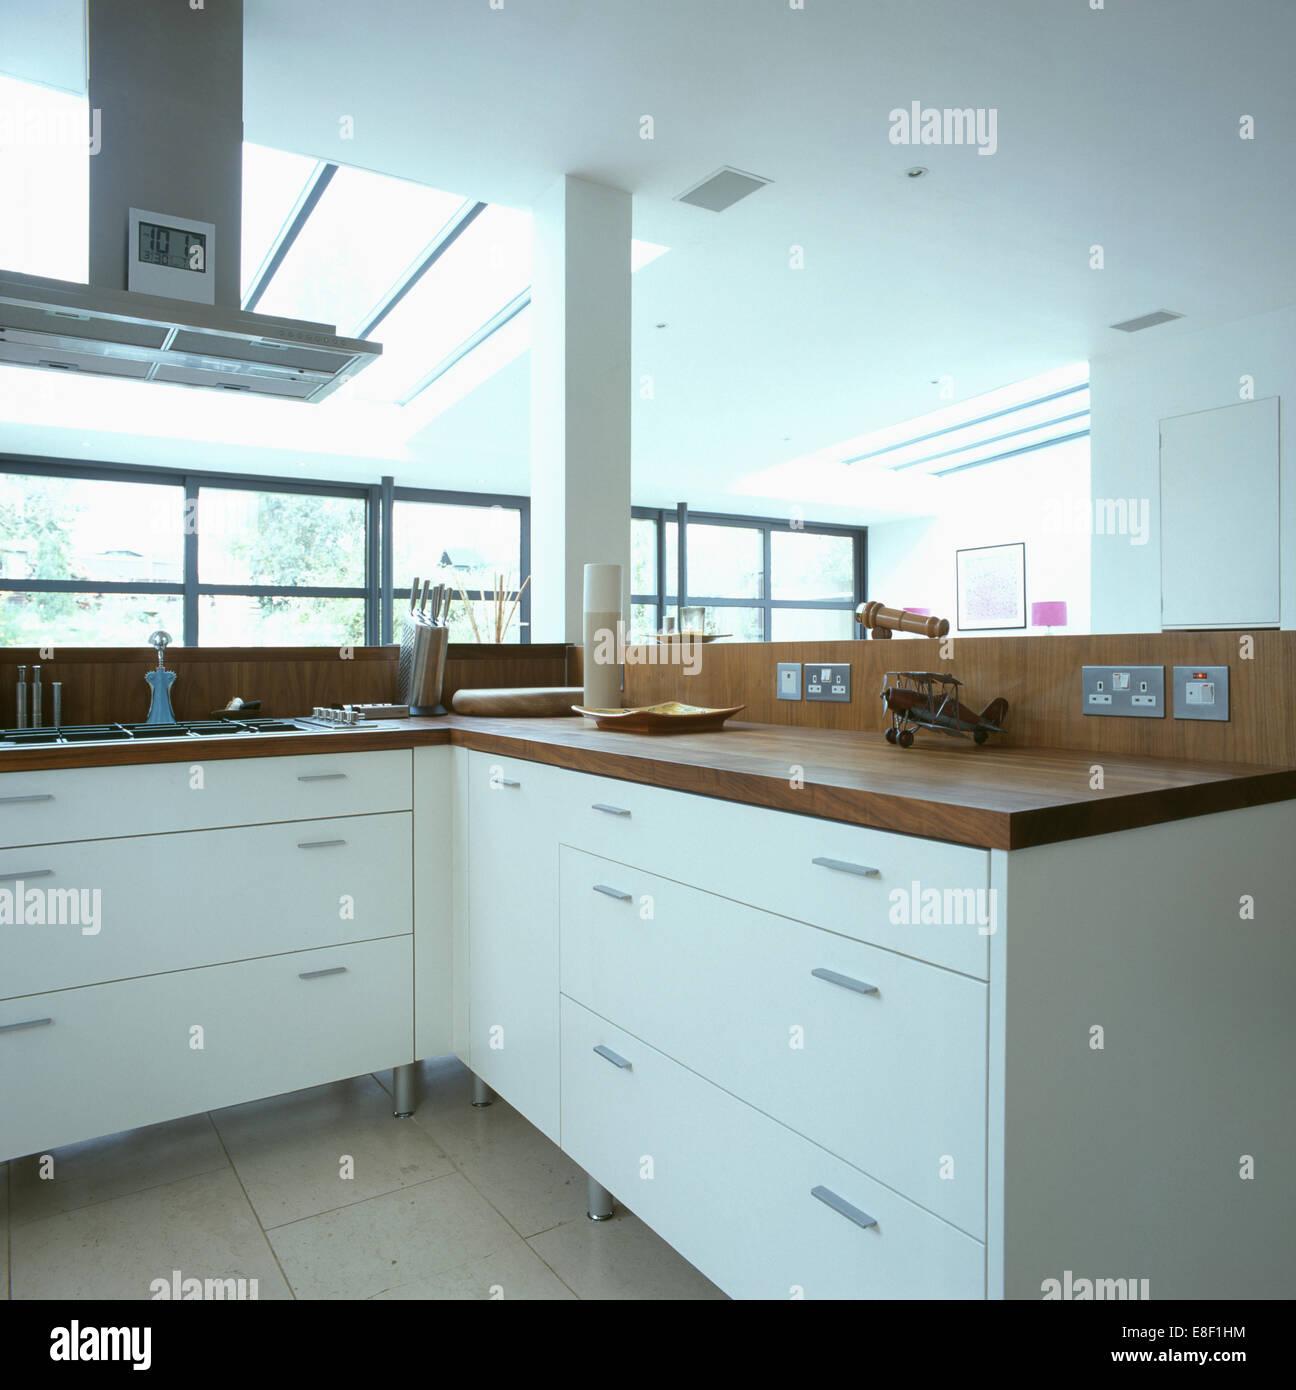 Kitchen Monochromatic Architectural Stock Photos & Kitchen ...